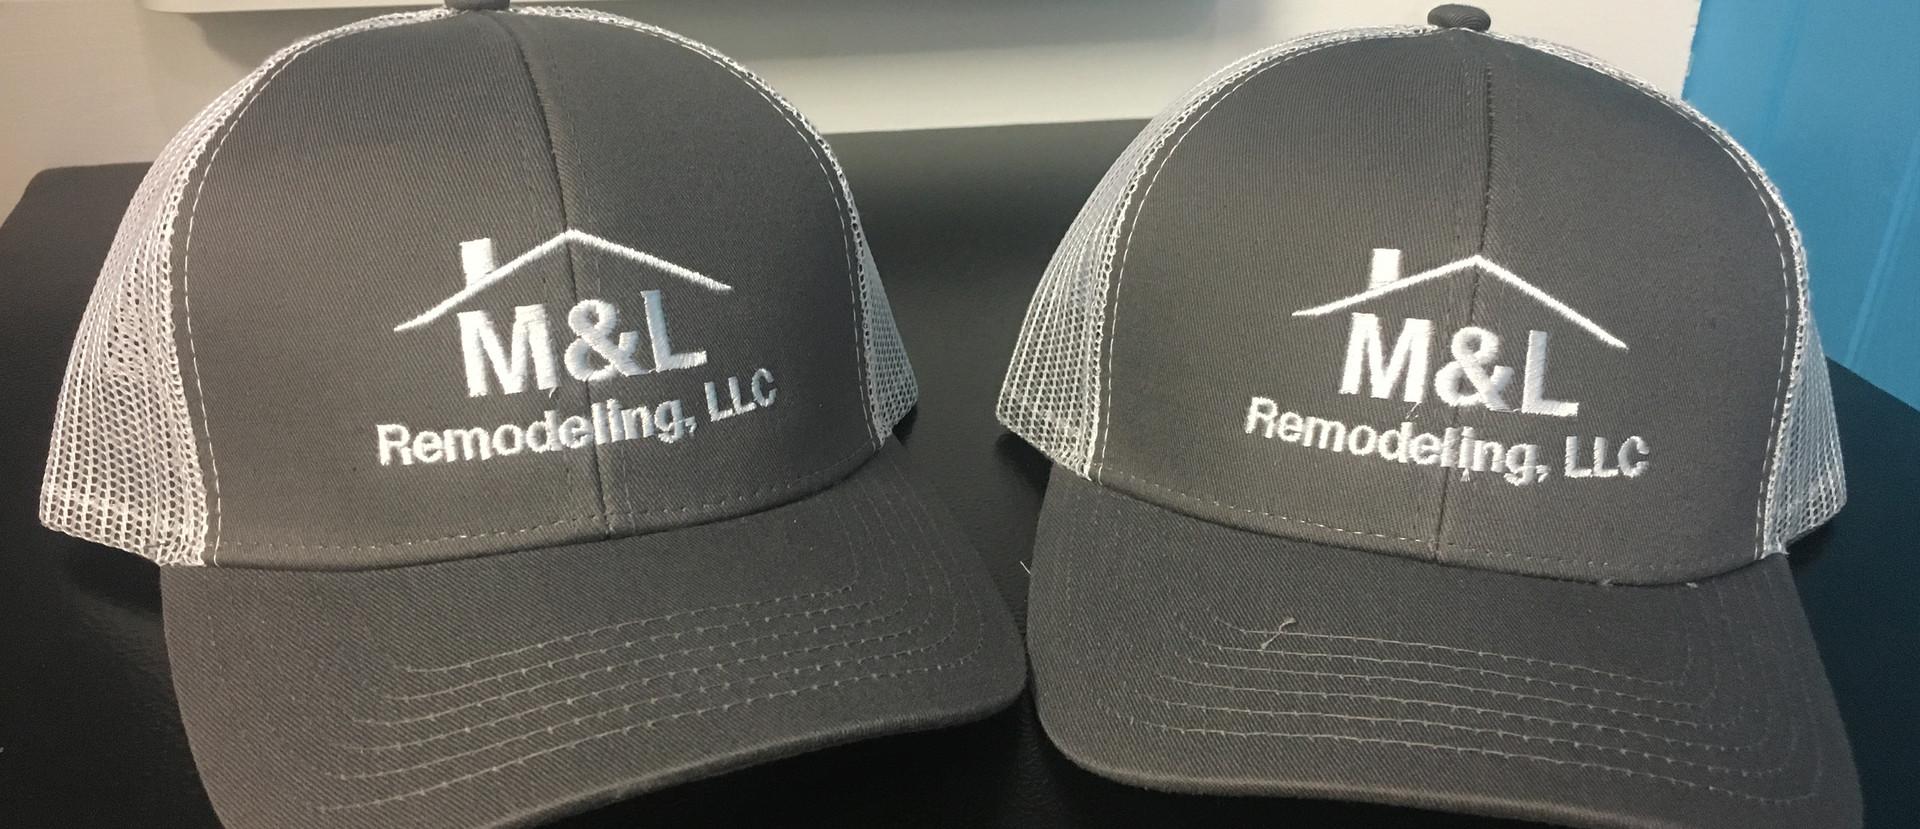 M & L Remodeling-Caps.jpg